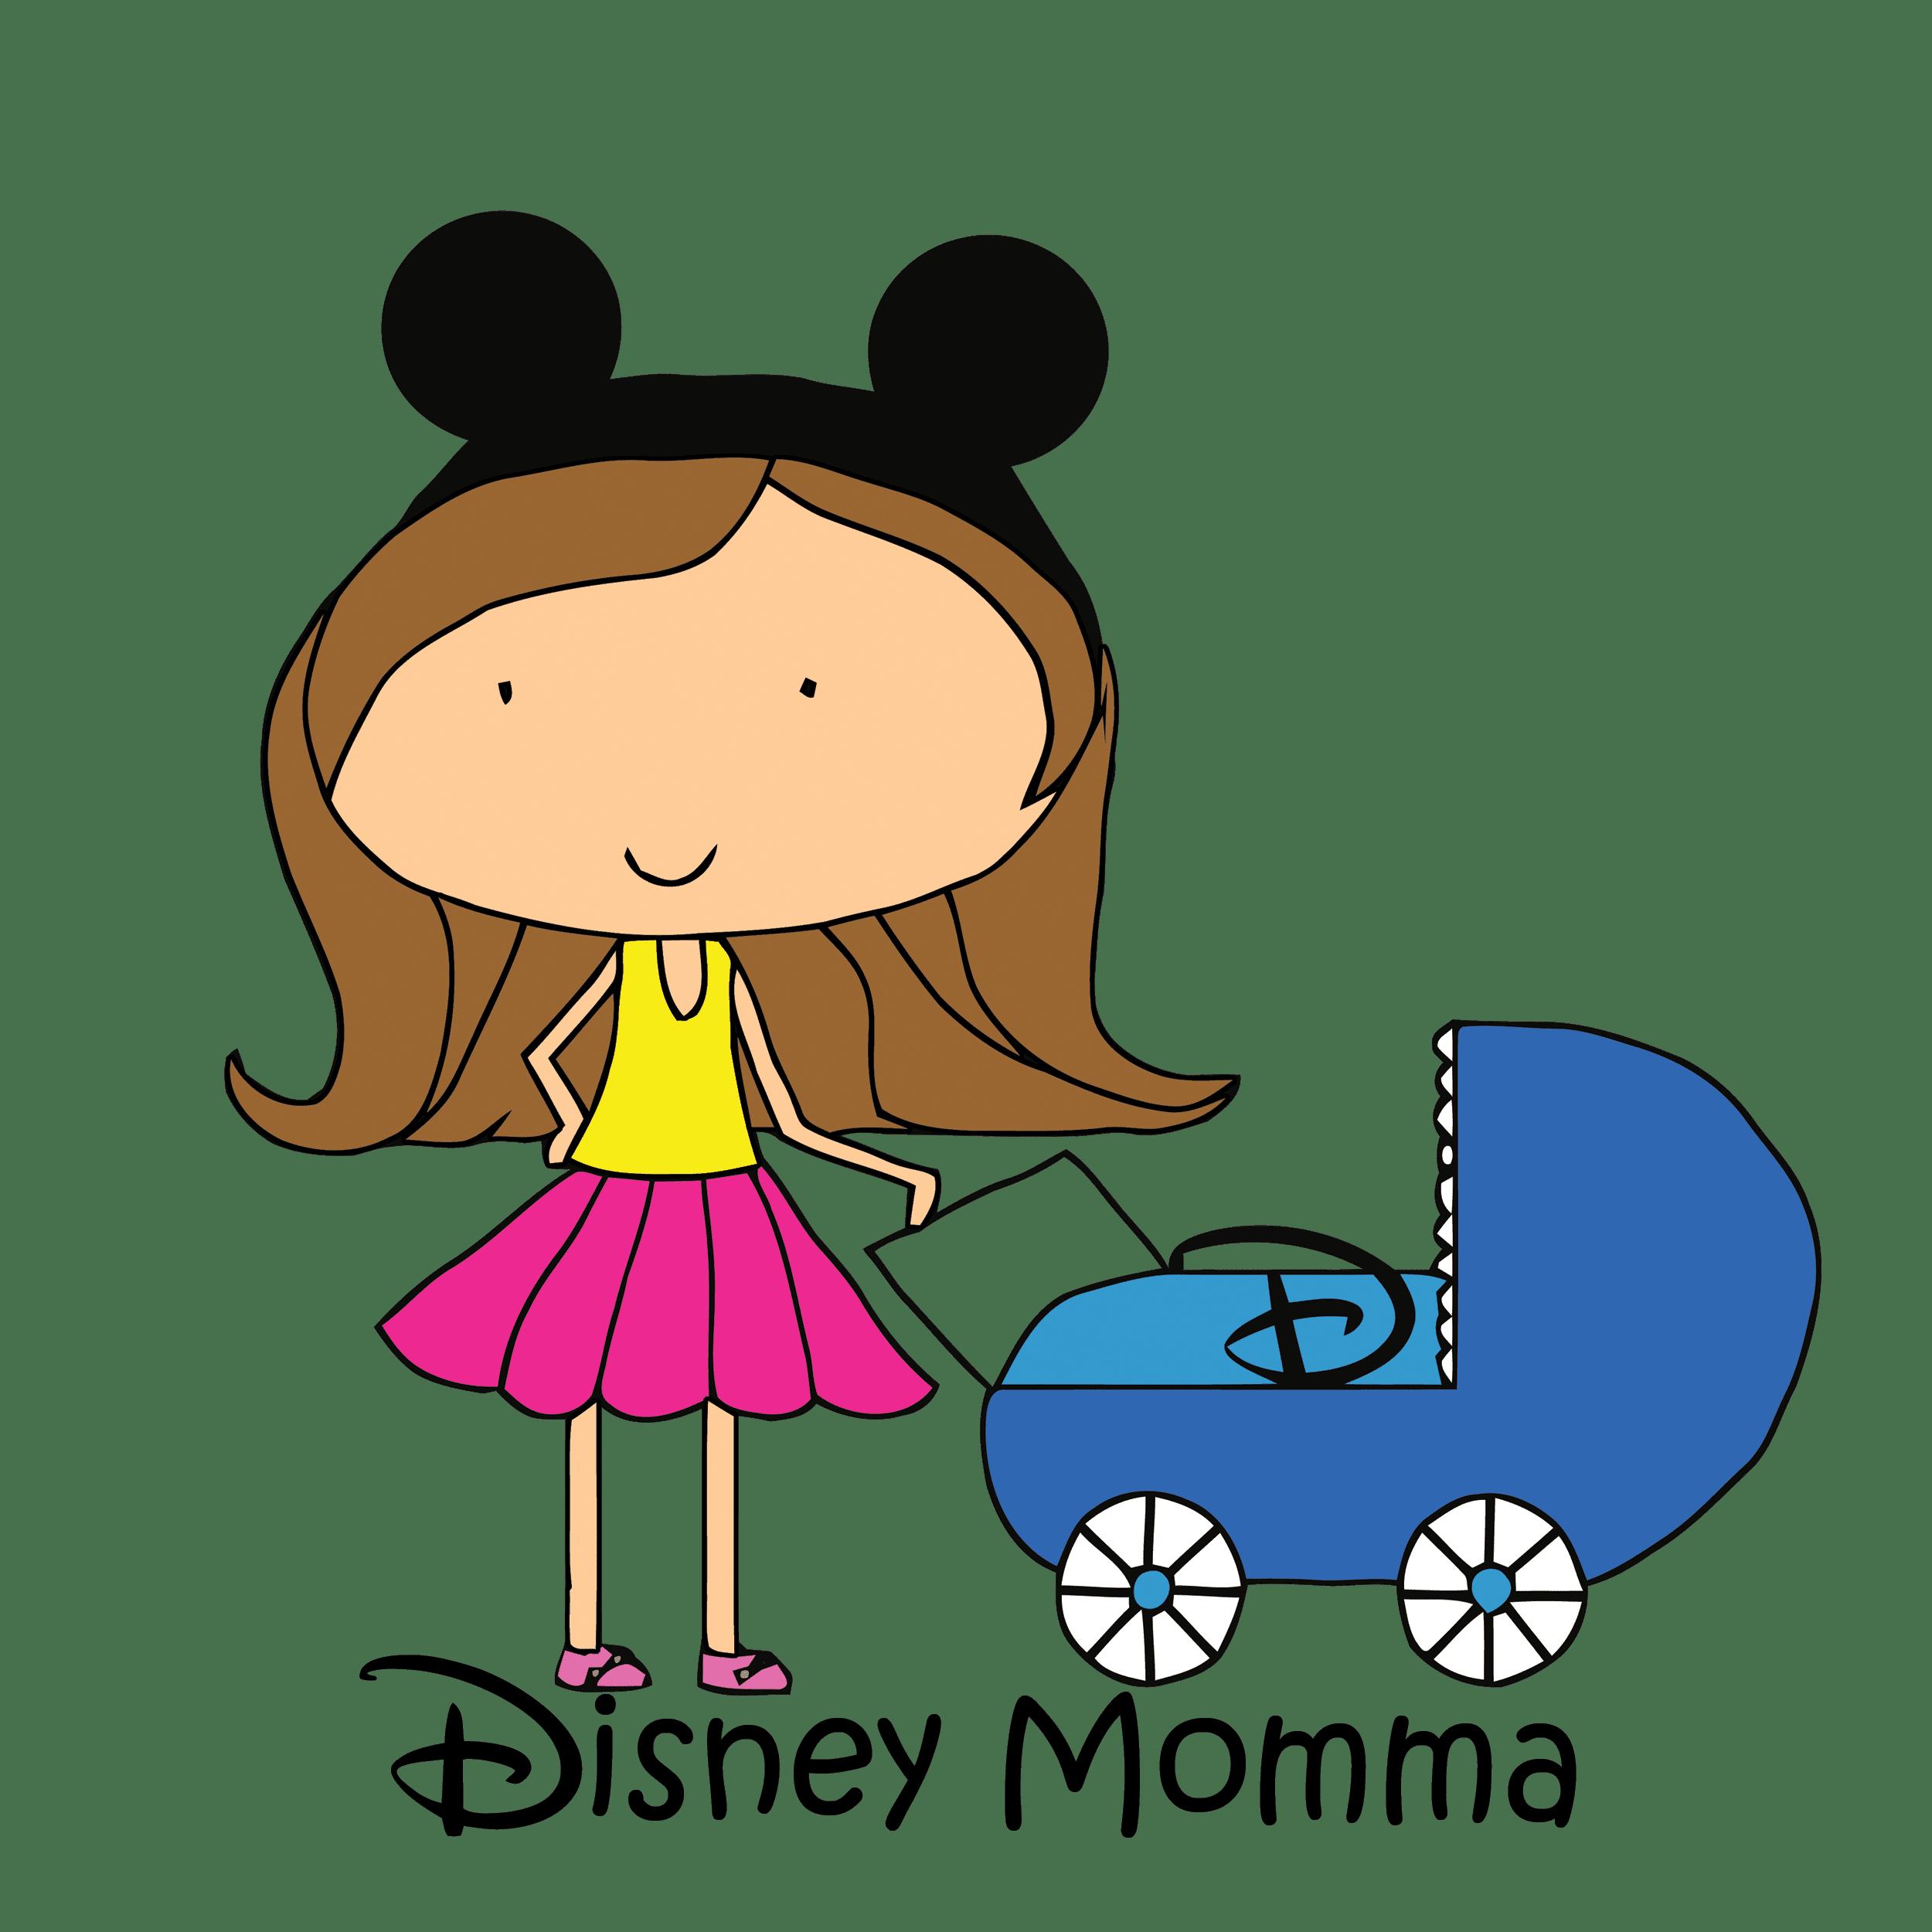 Disney Momma